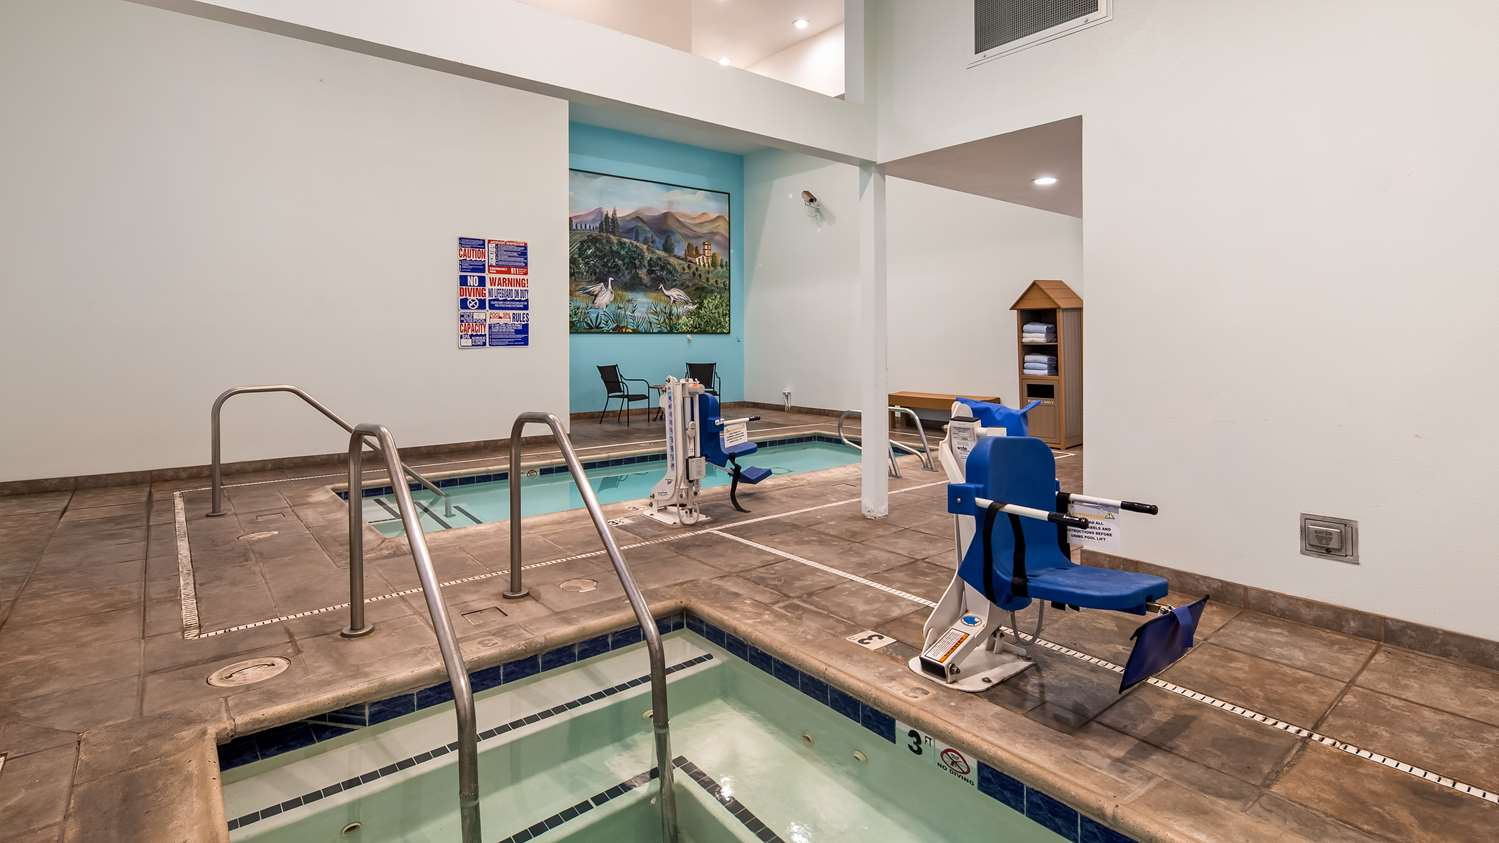 Best Western I 5 Inn Amp Suites Lodi Ca See Discounts